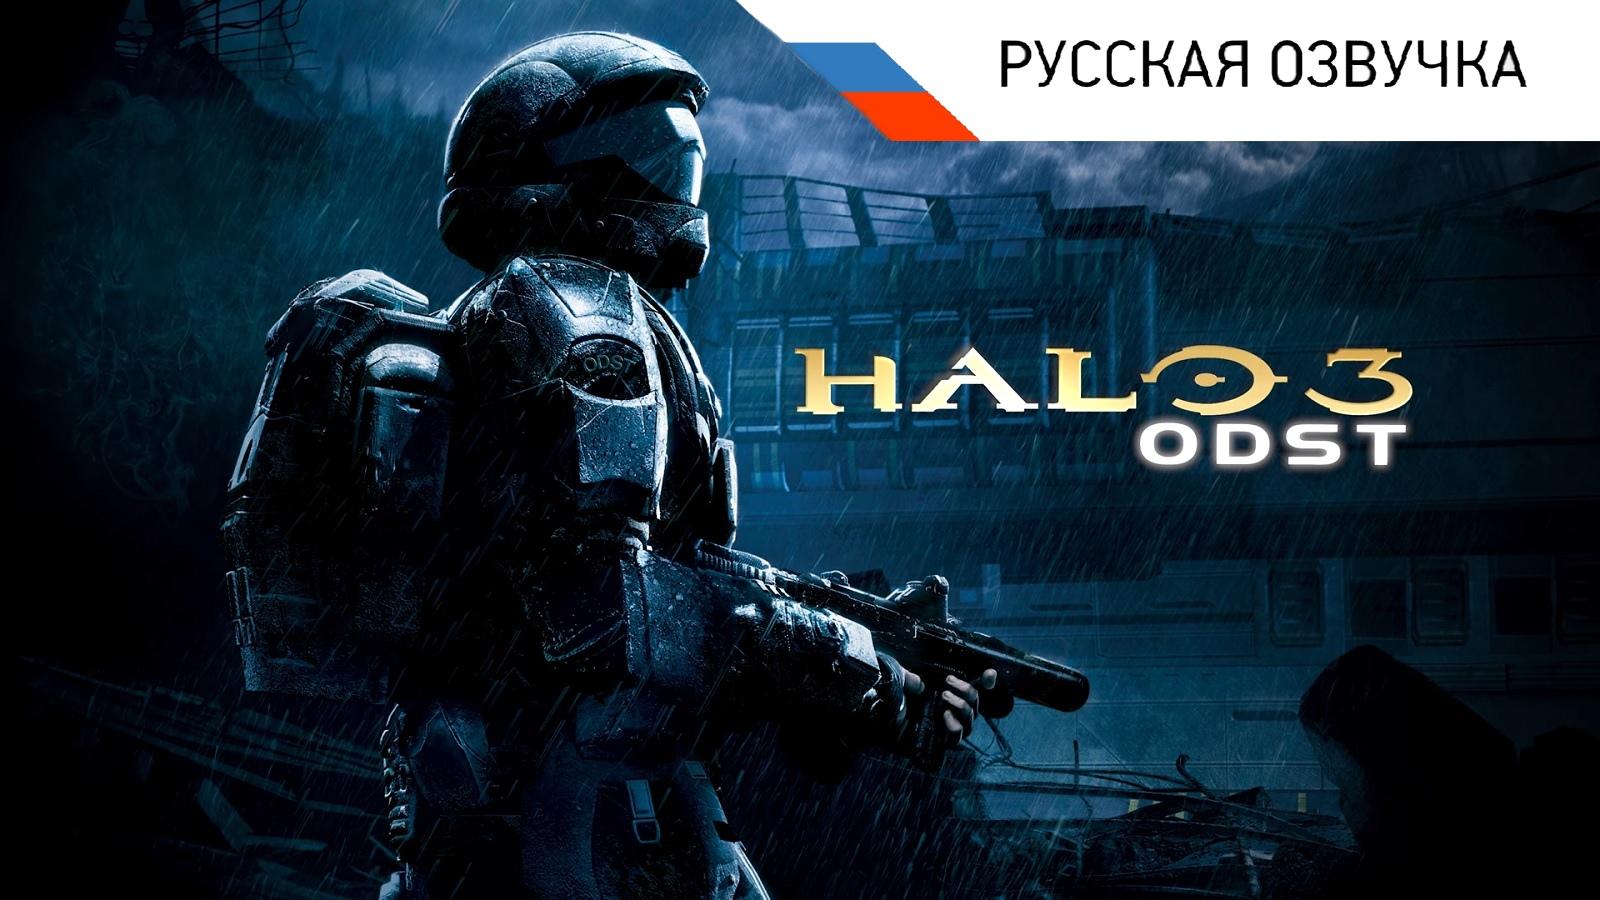 Студия FreedomHellVOICE начала сбор средств на русскую озвучку Halo 3: ODST